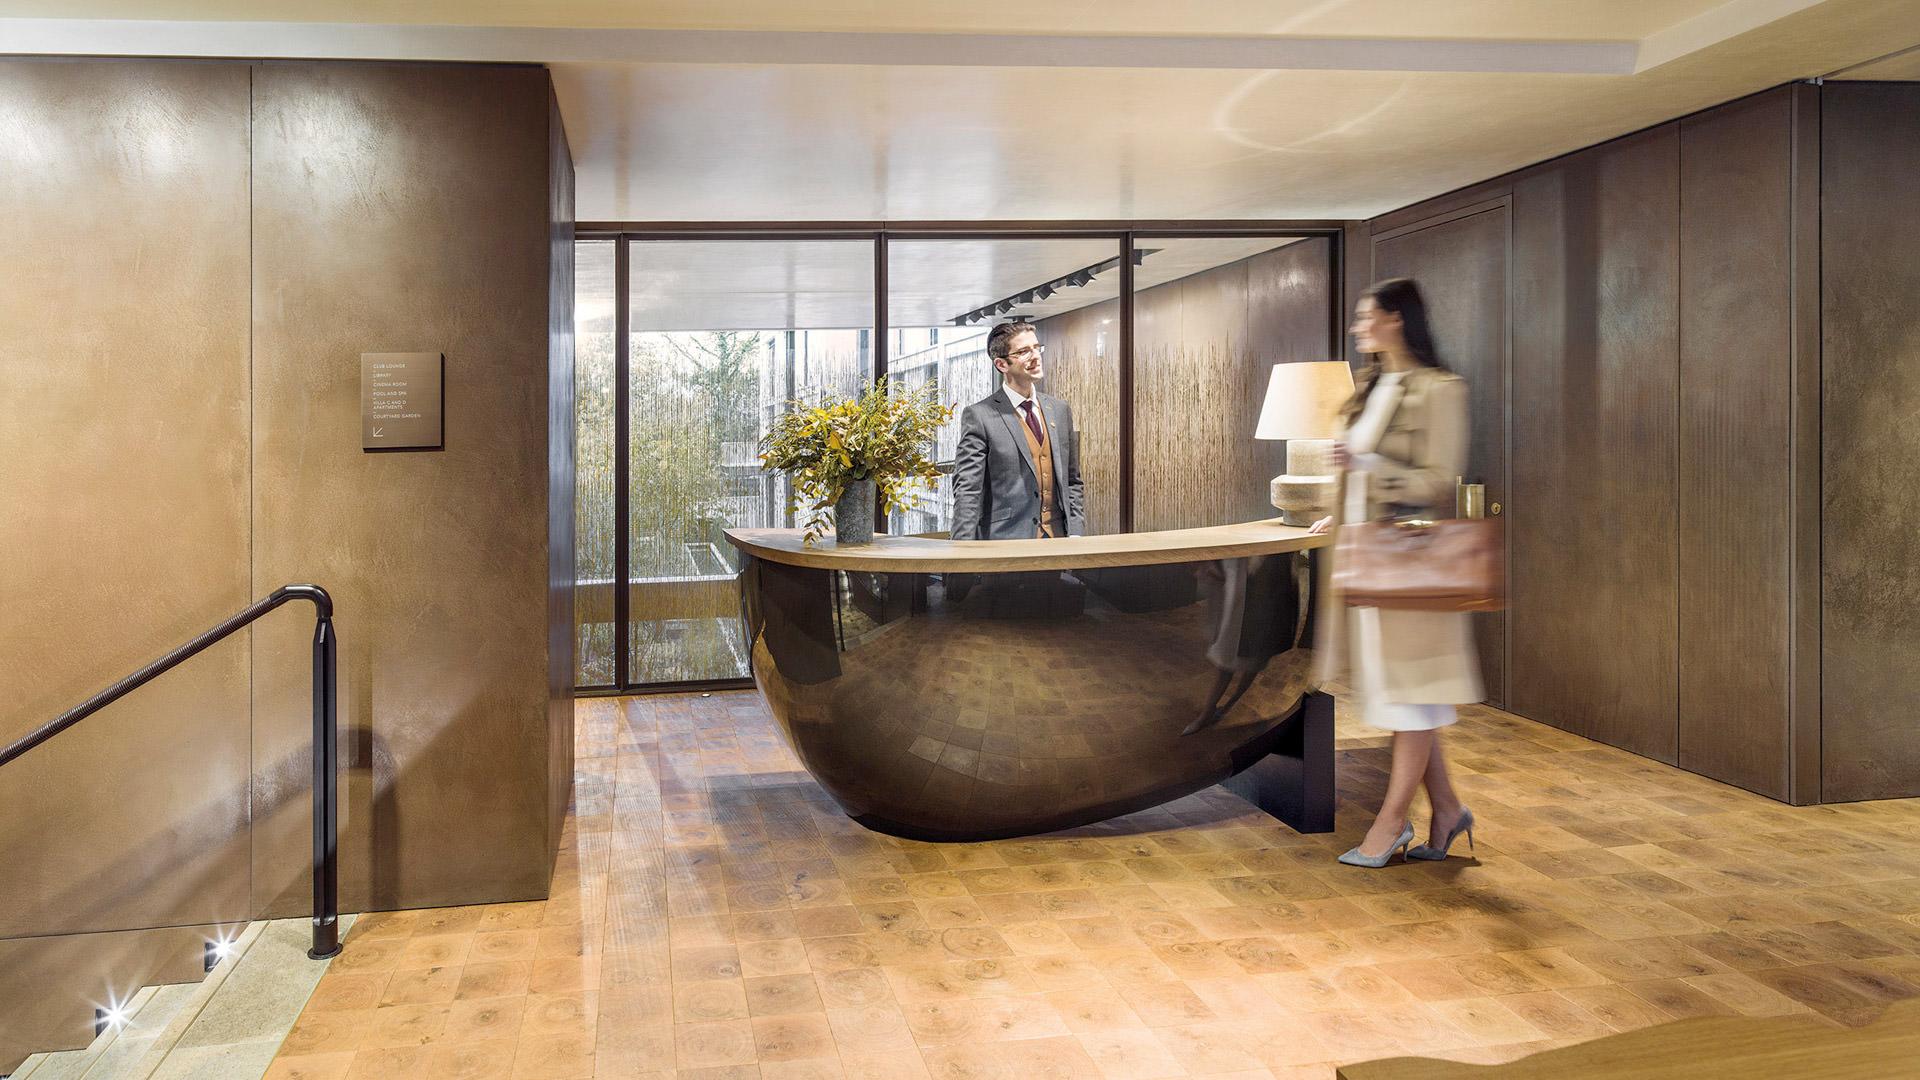 Concierge Ioannina - Hotels & Accommodation